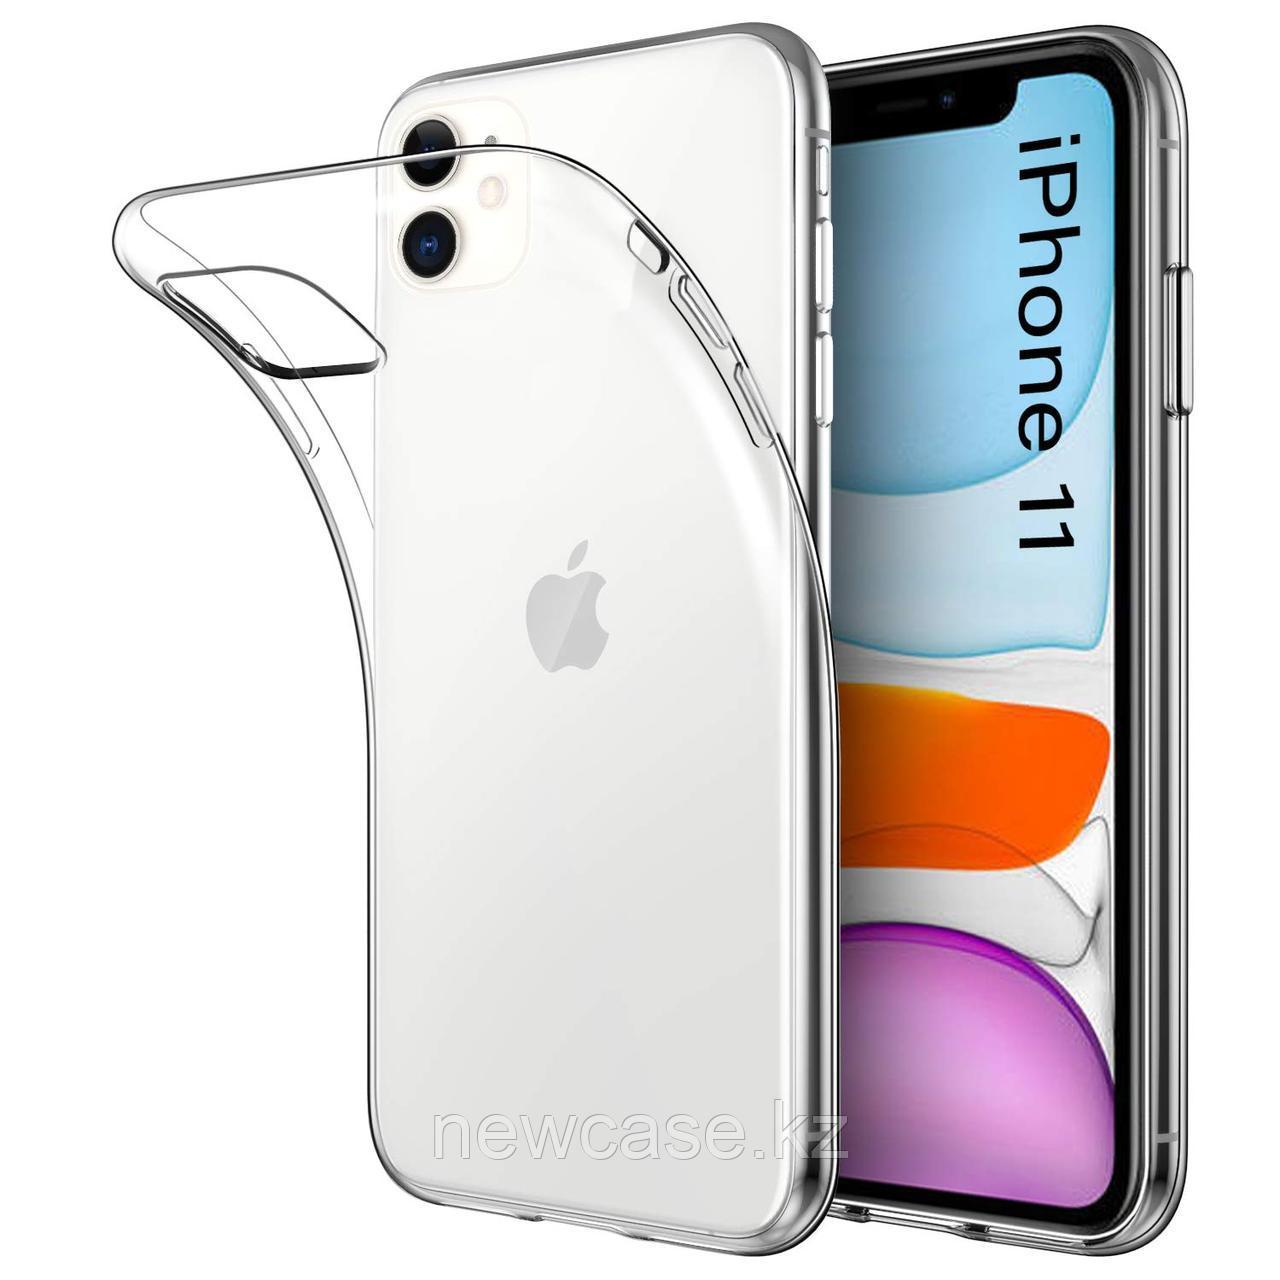 Силиконовый прозрачный чехол для iPhone 5/6/7/8/X/XR/XS Max/11/11 Pro/11 Pro Max - фото 2